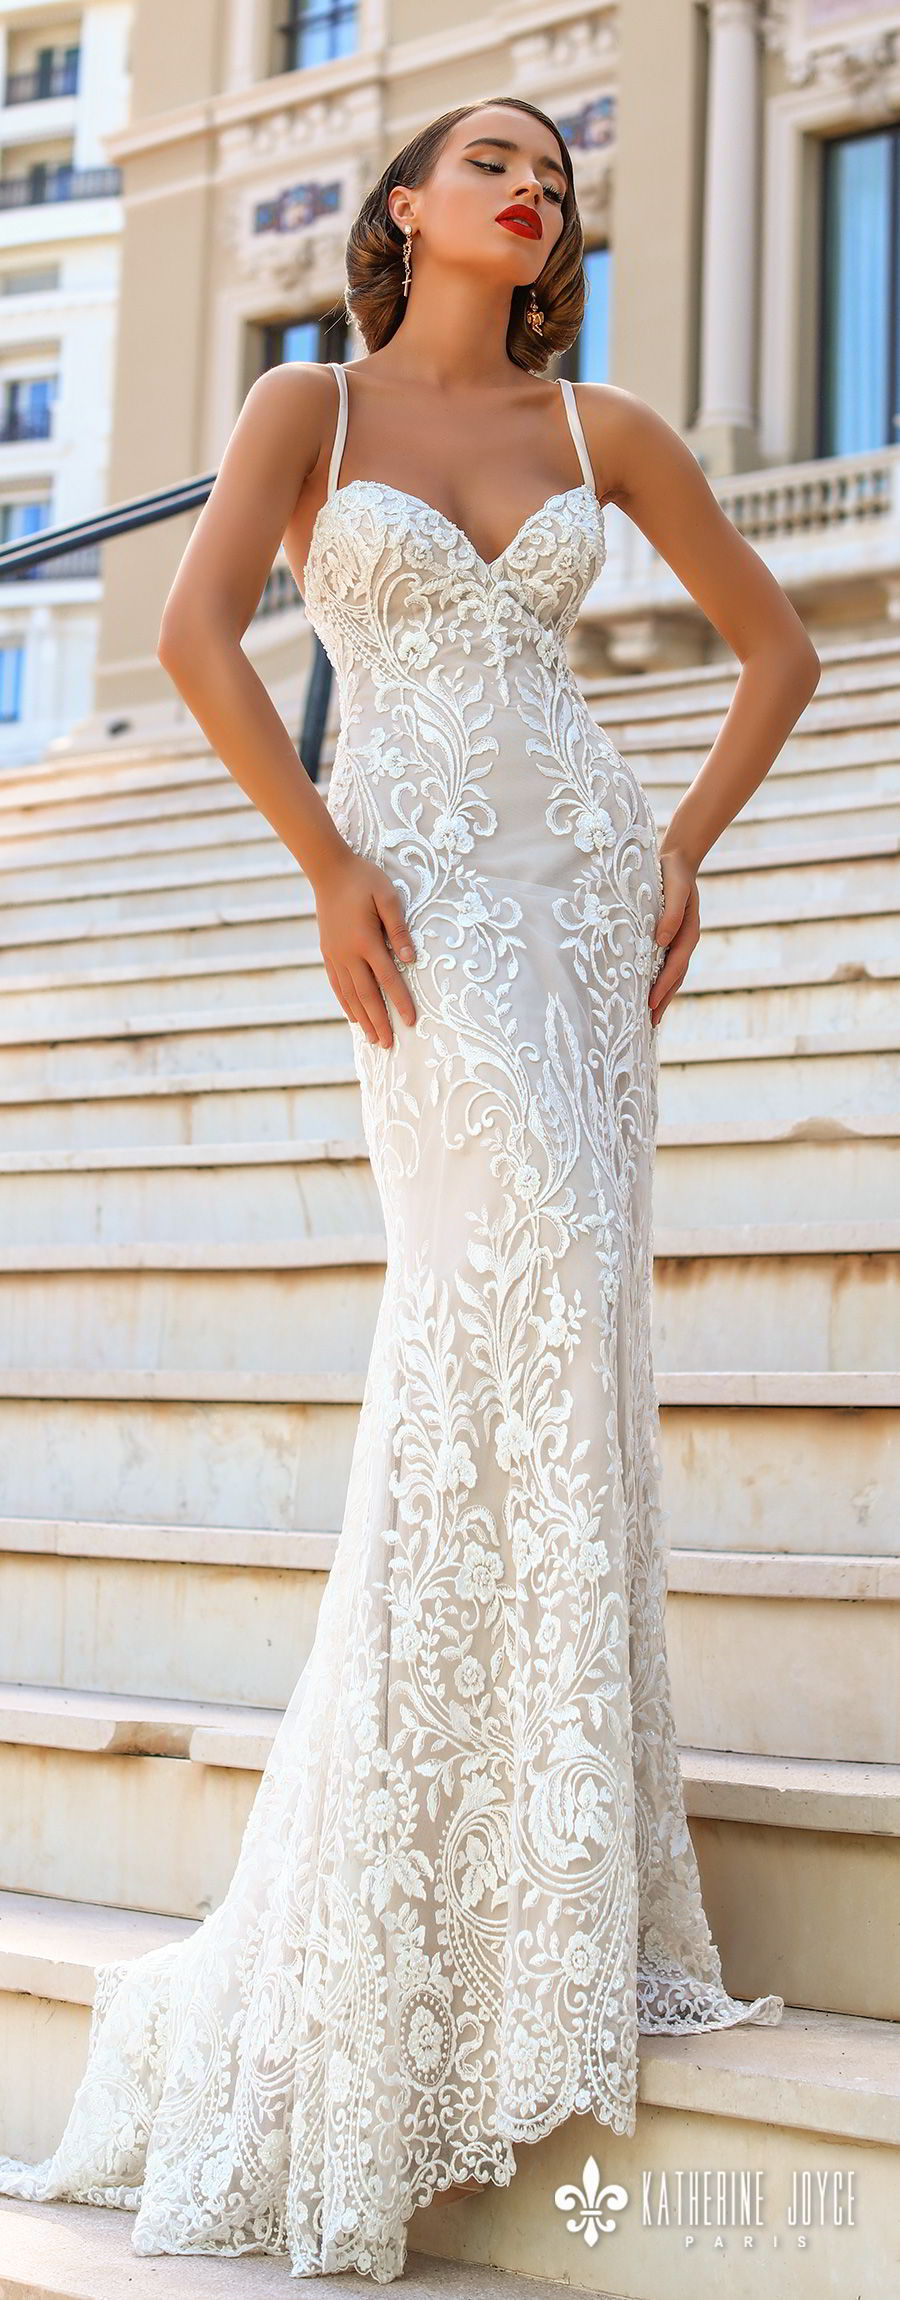 katherine joyce 2018 bridal sleeveless thin strap sweetheart neckline full embellishment elegant sheath wedding dress cross strap back sweep train (kendall) mv